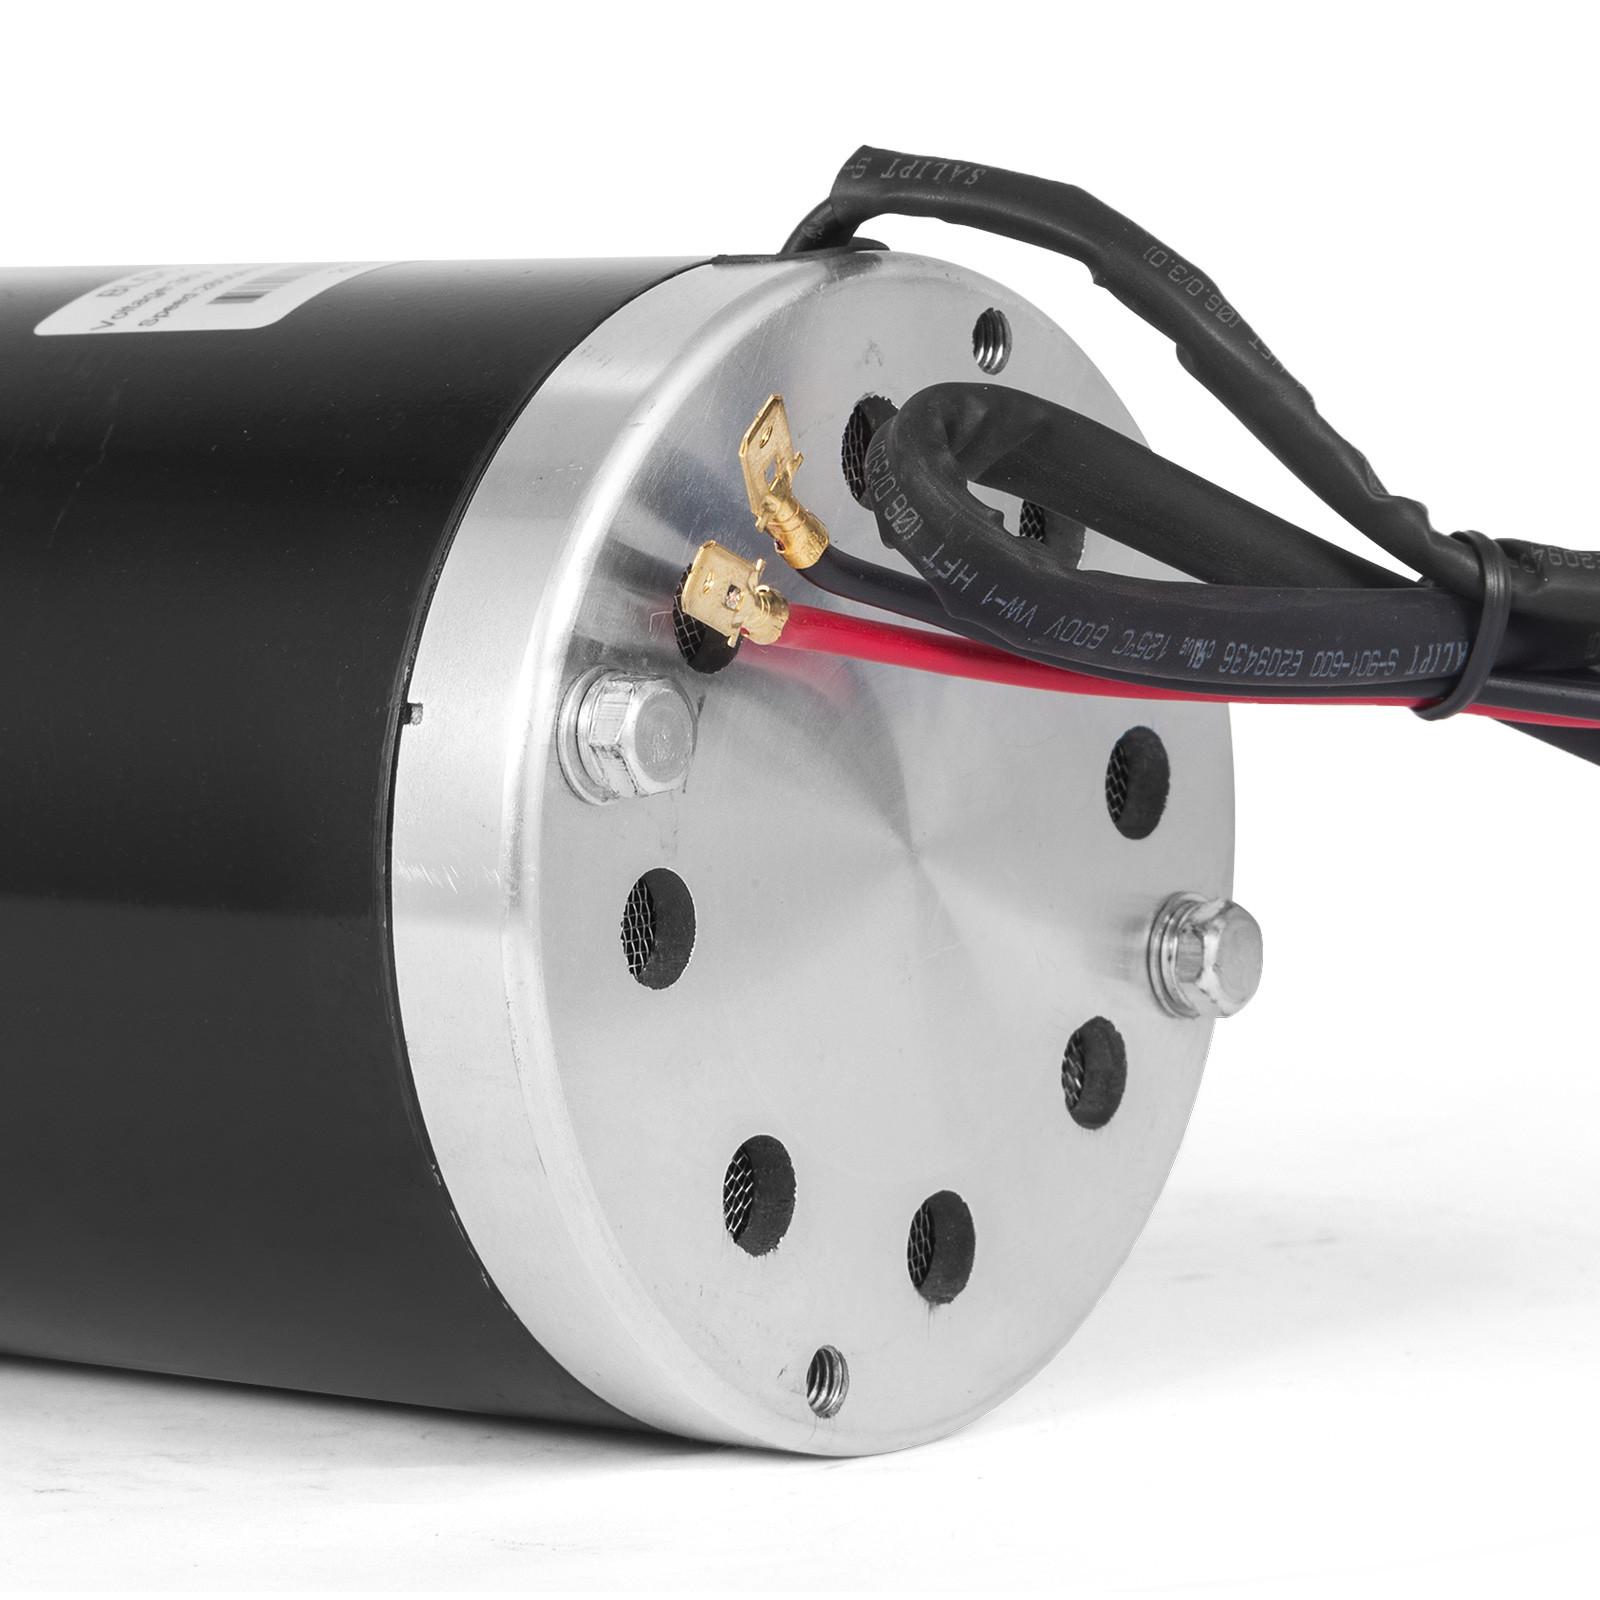 DC-electric-motor-12-60V-150W-2KW-for-scooter-bike-go-kart-minibike-e-ATV thumbnail 131